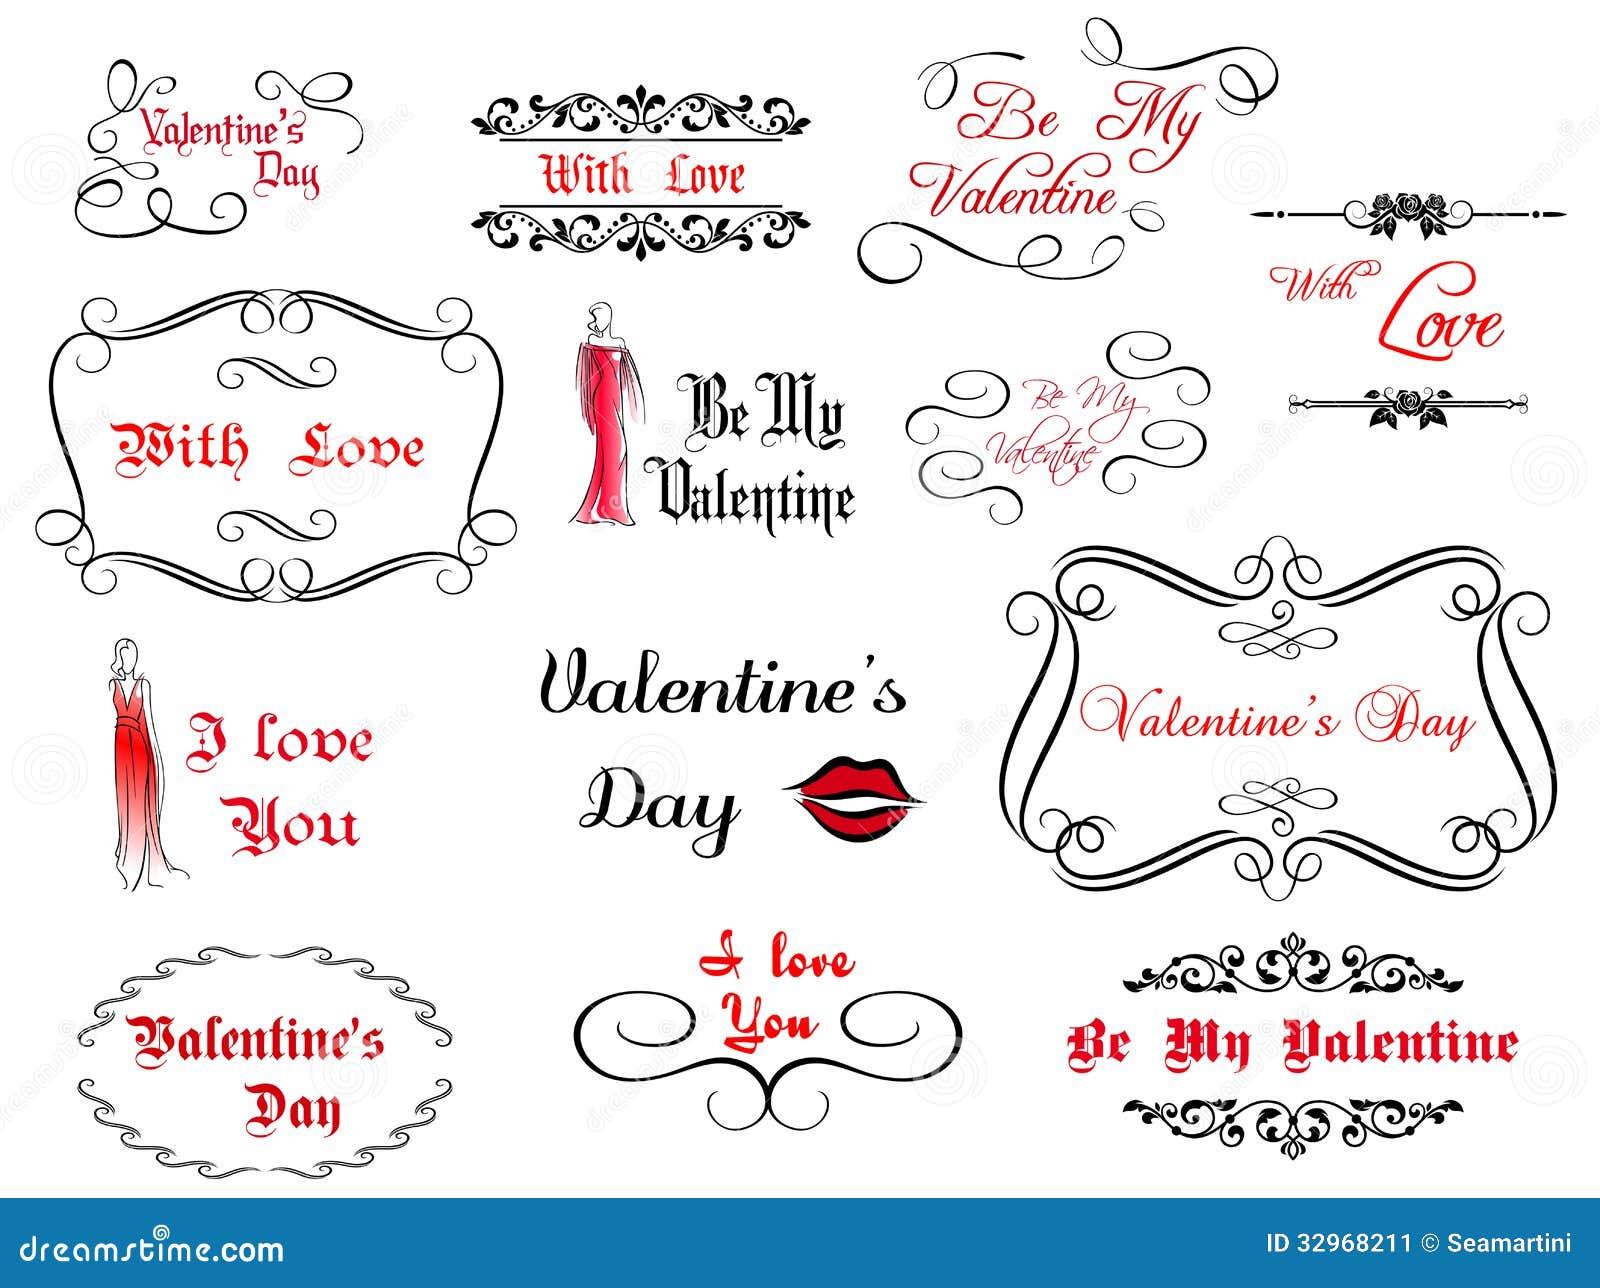 Imagem Vetorial Gratis Mapa Pinos Illustrator Titular: 套爱和华伦泰的书法标题 向量例证. 插画